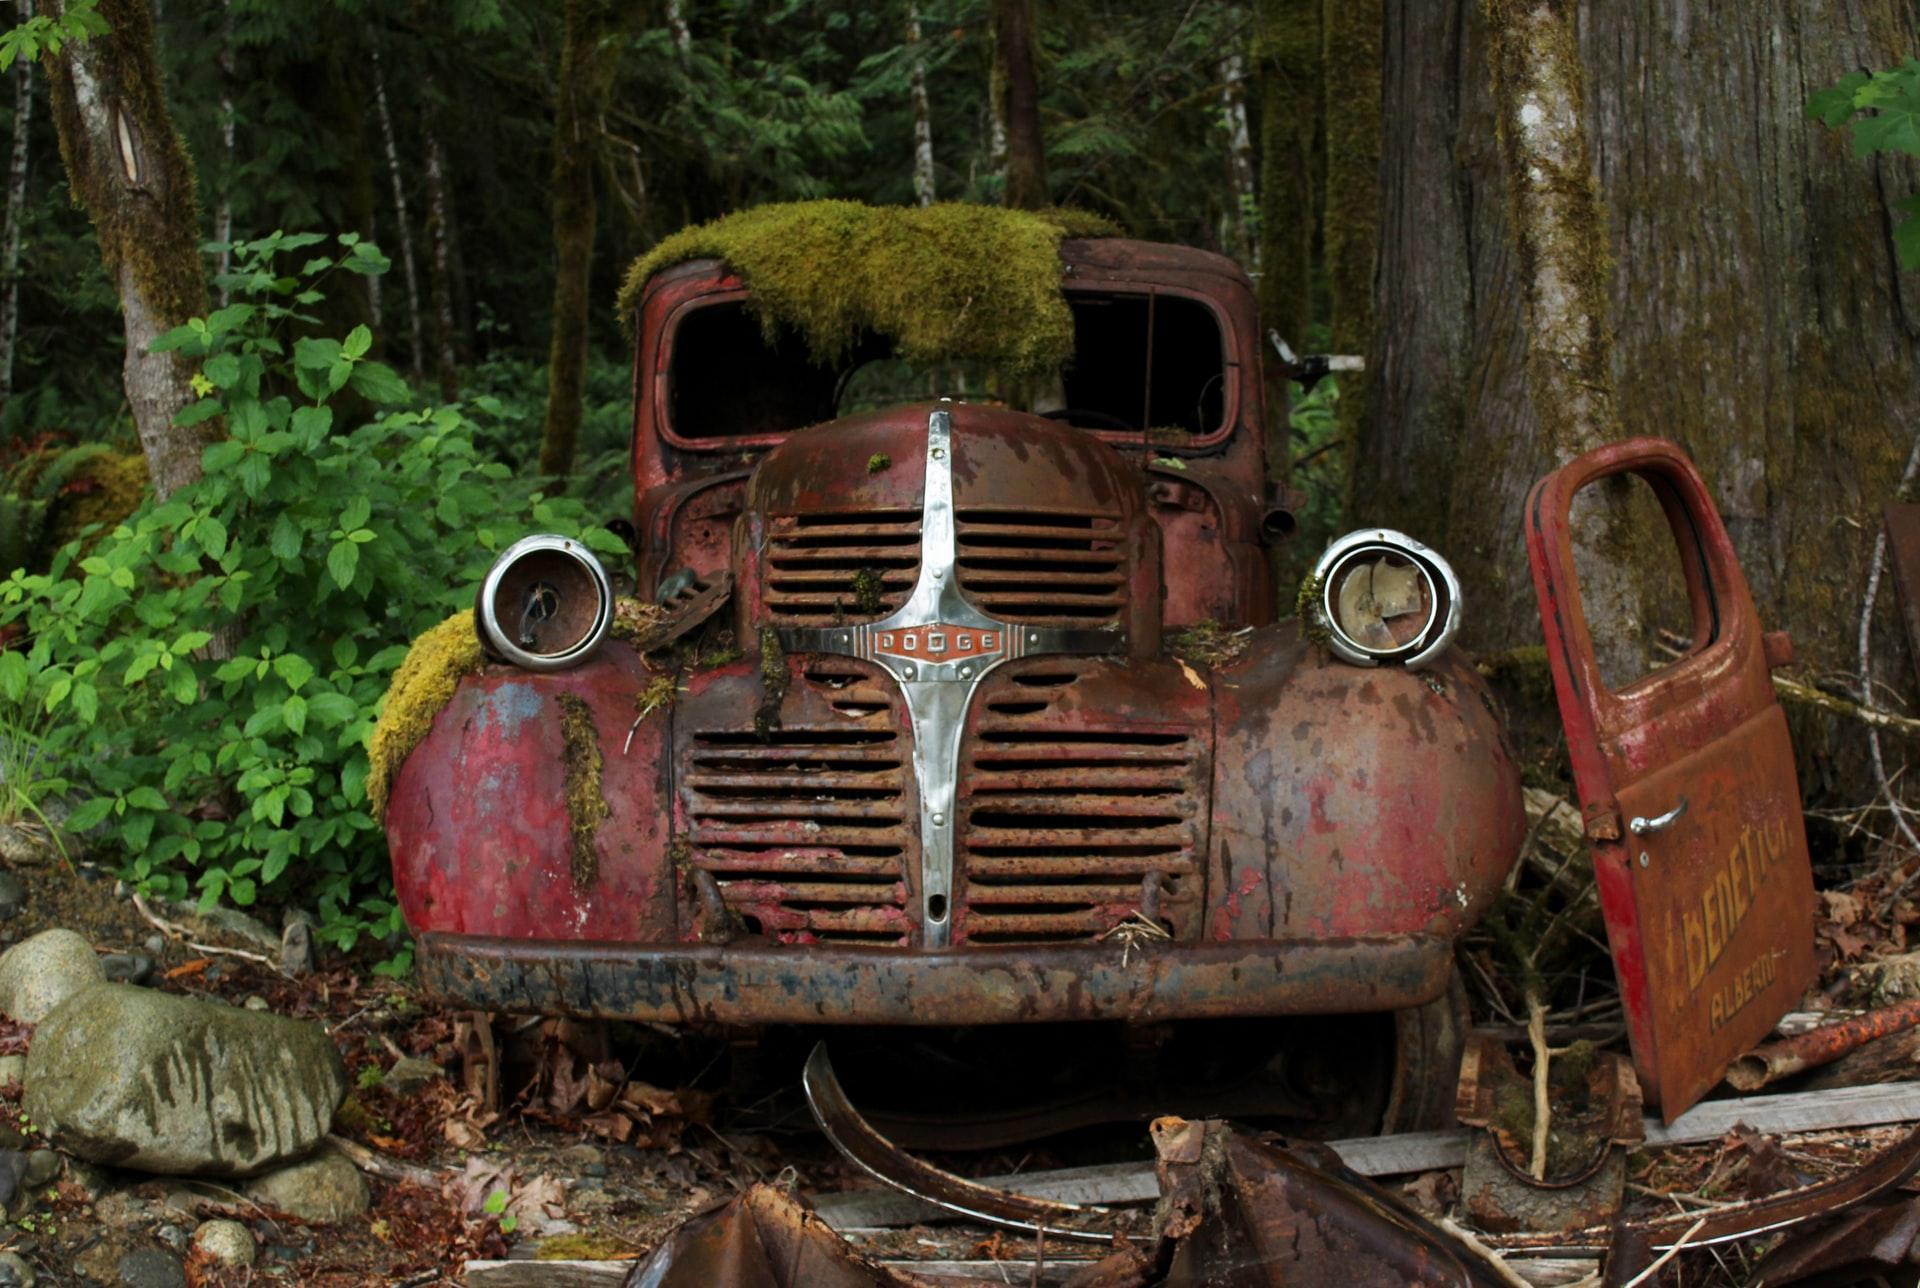 abandoned rusty car